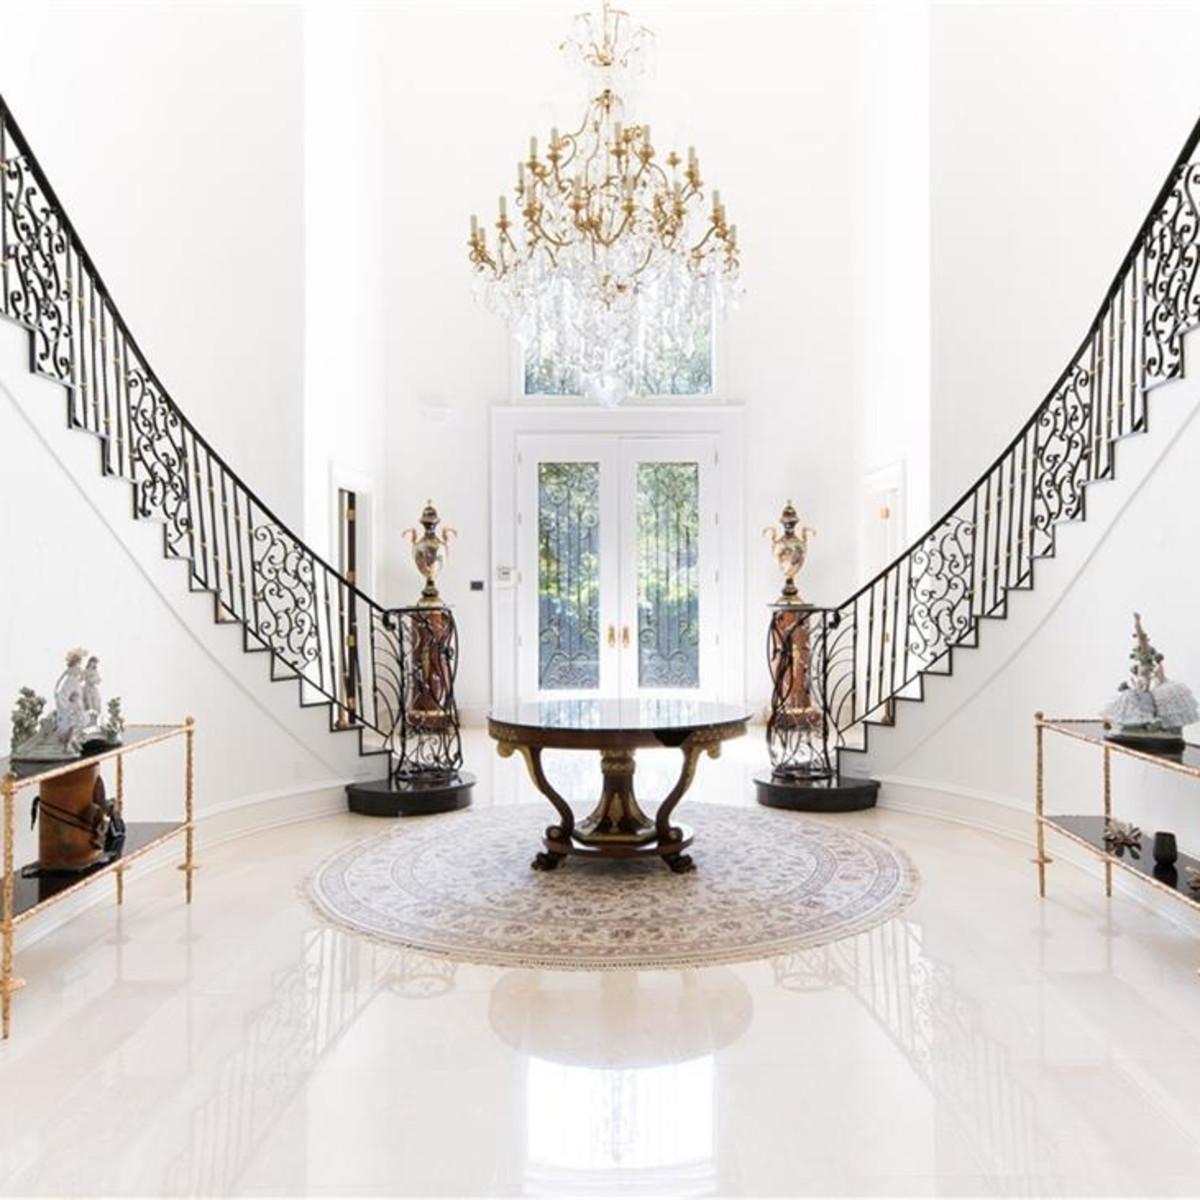 Dallas palace for sale, 9006 Douglas Ave.